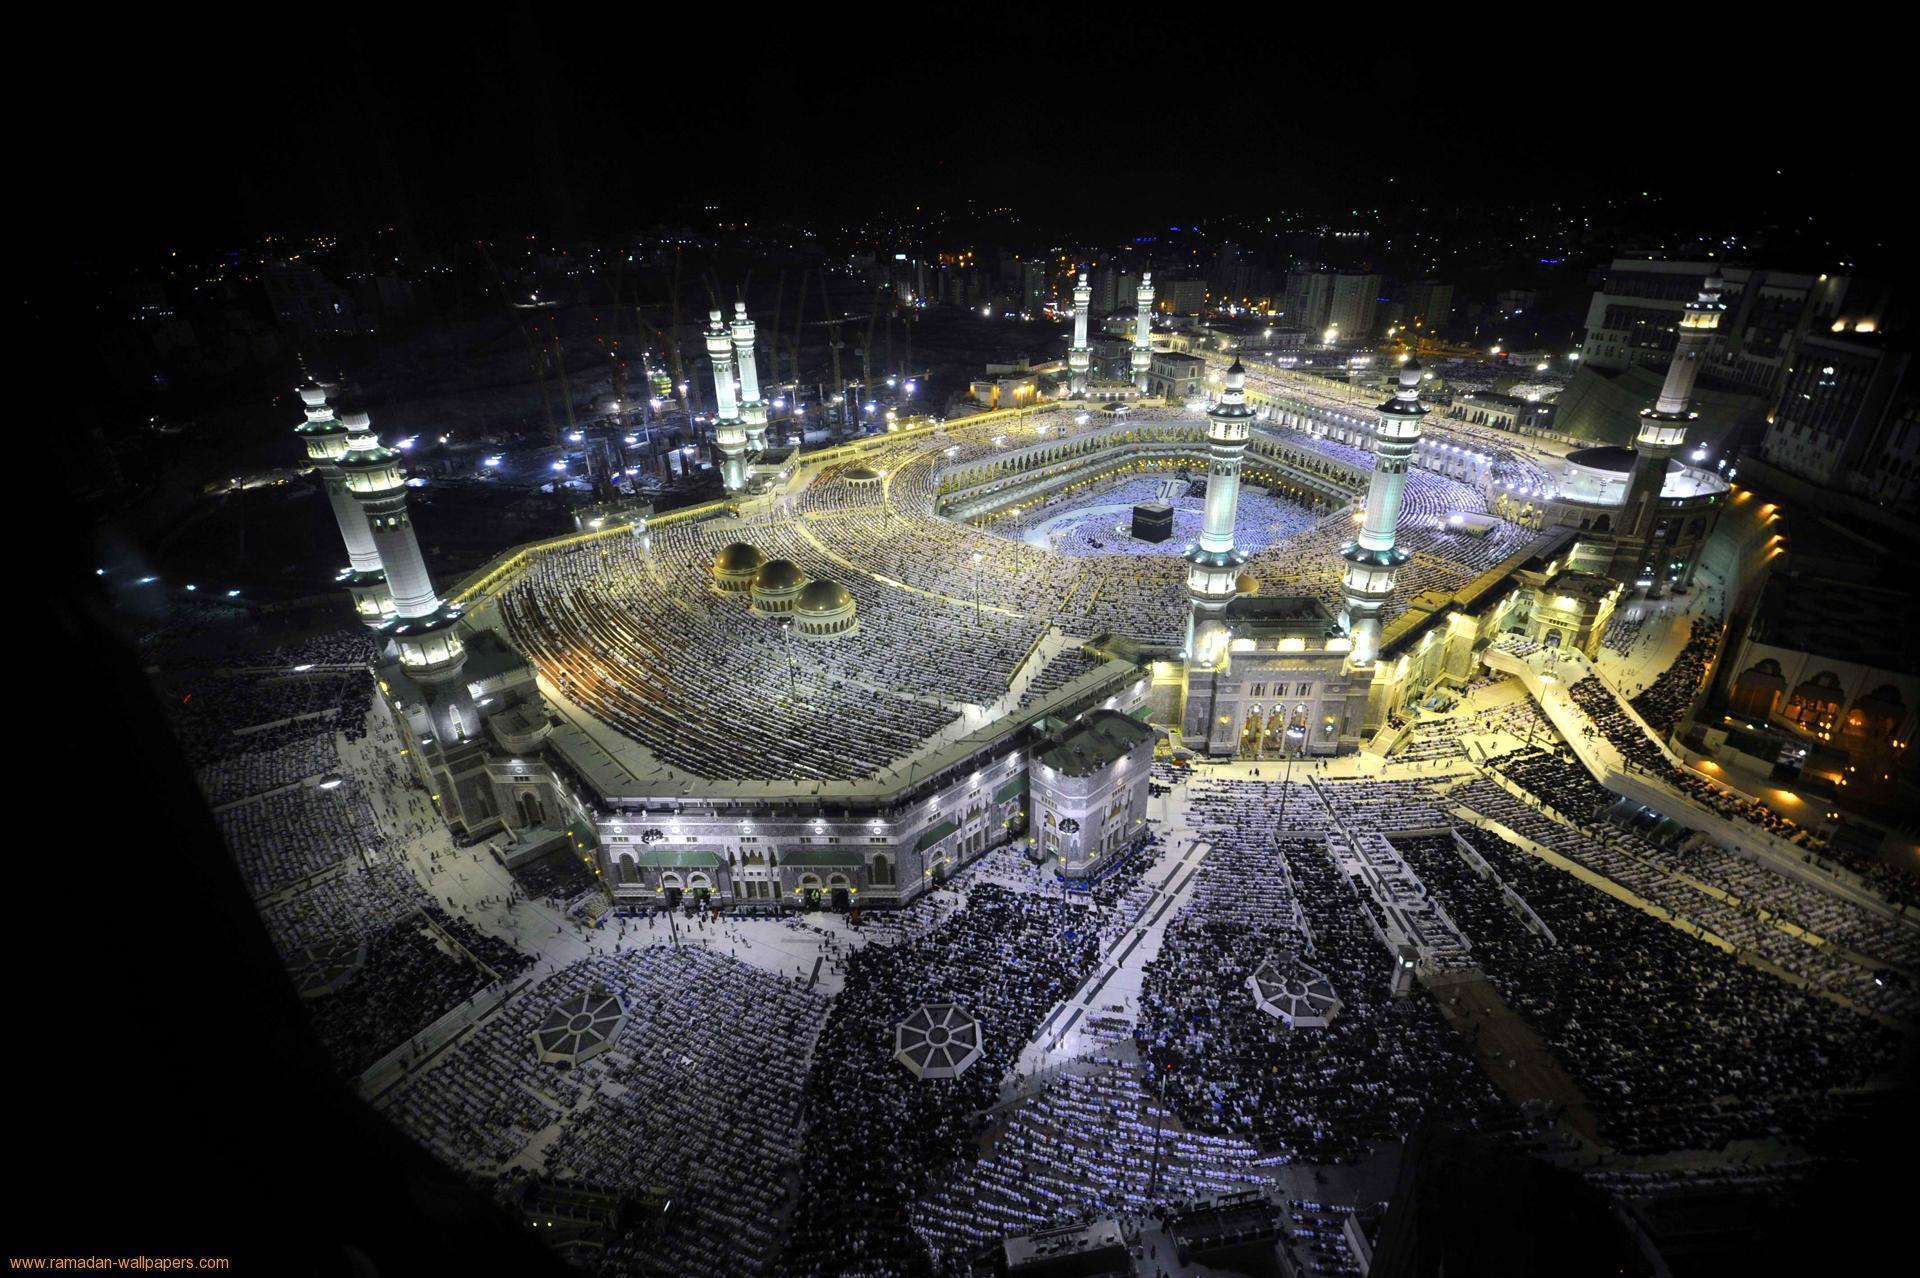 Mecca - City